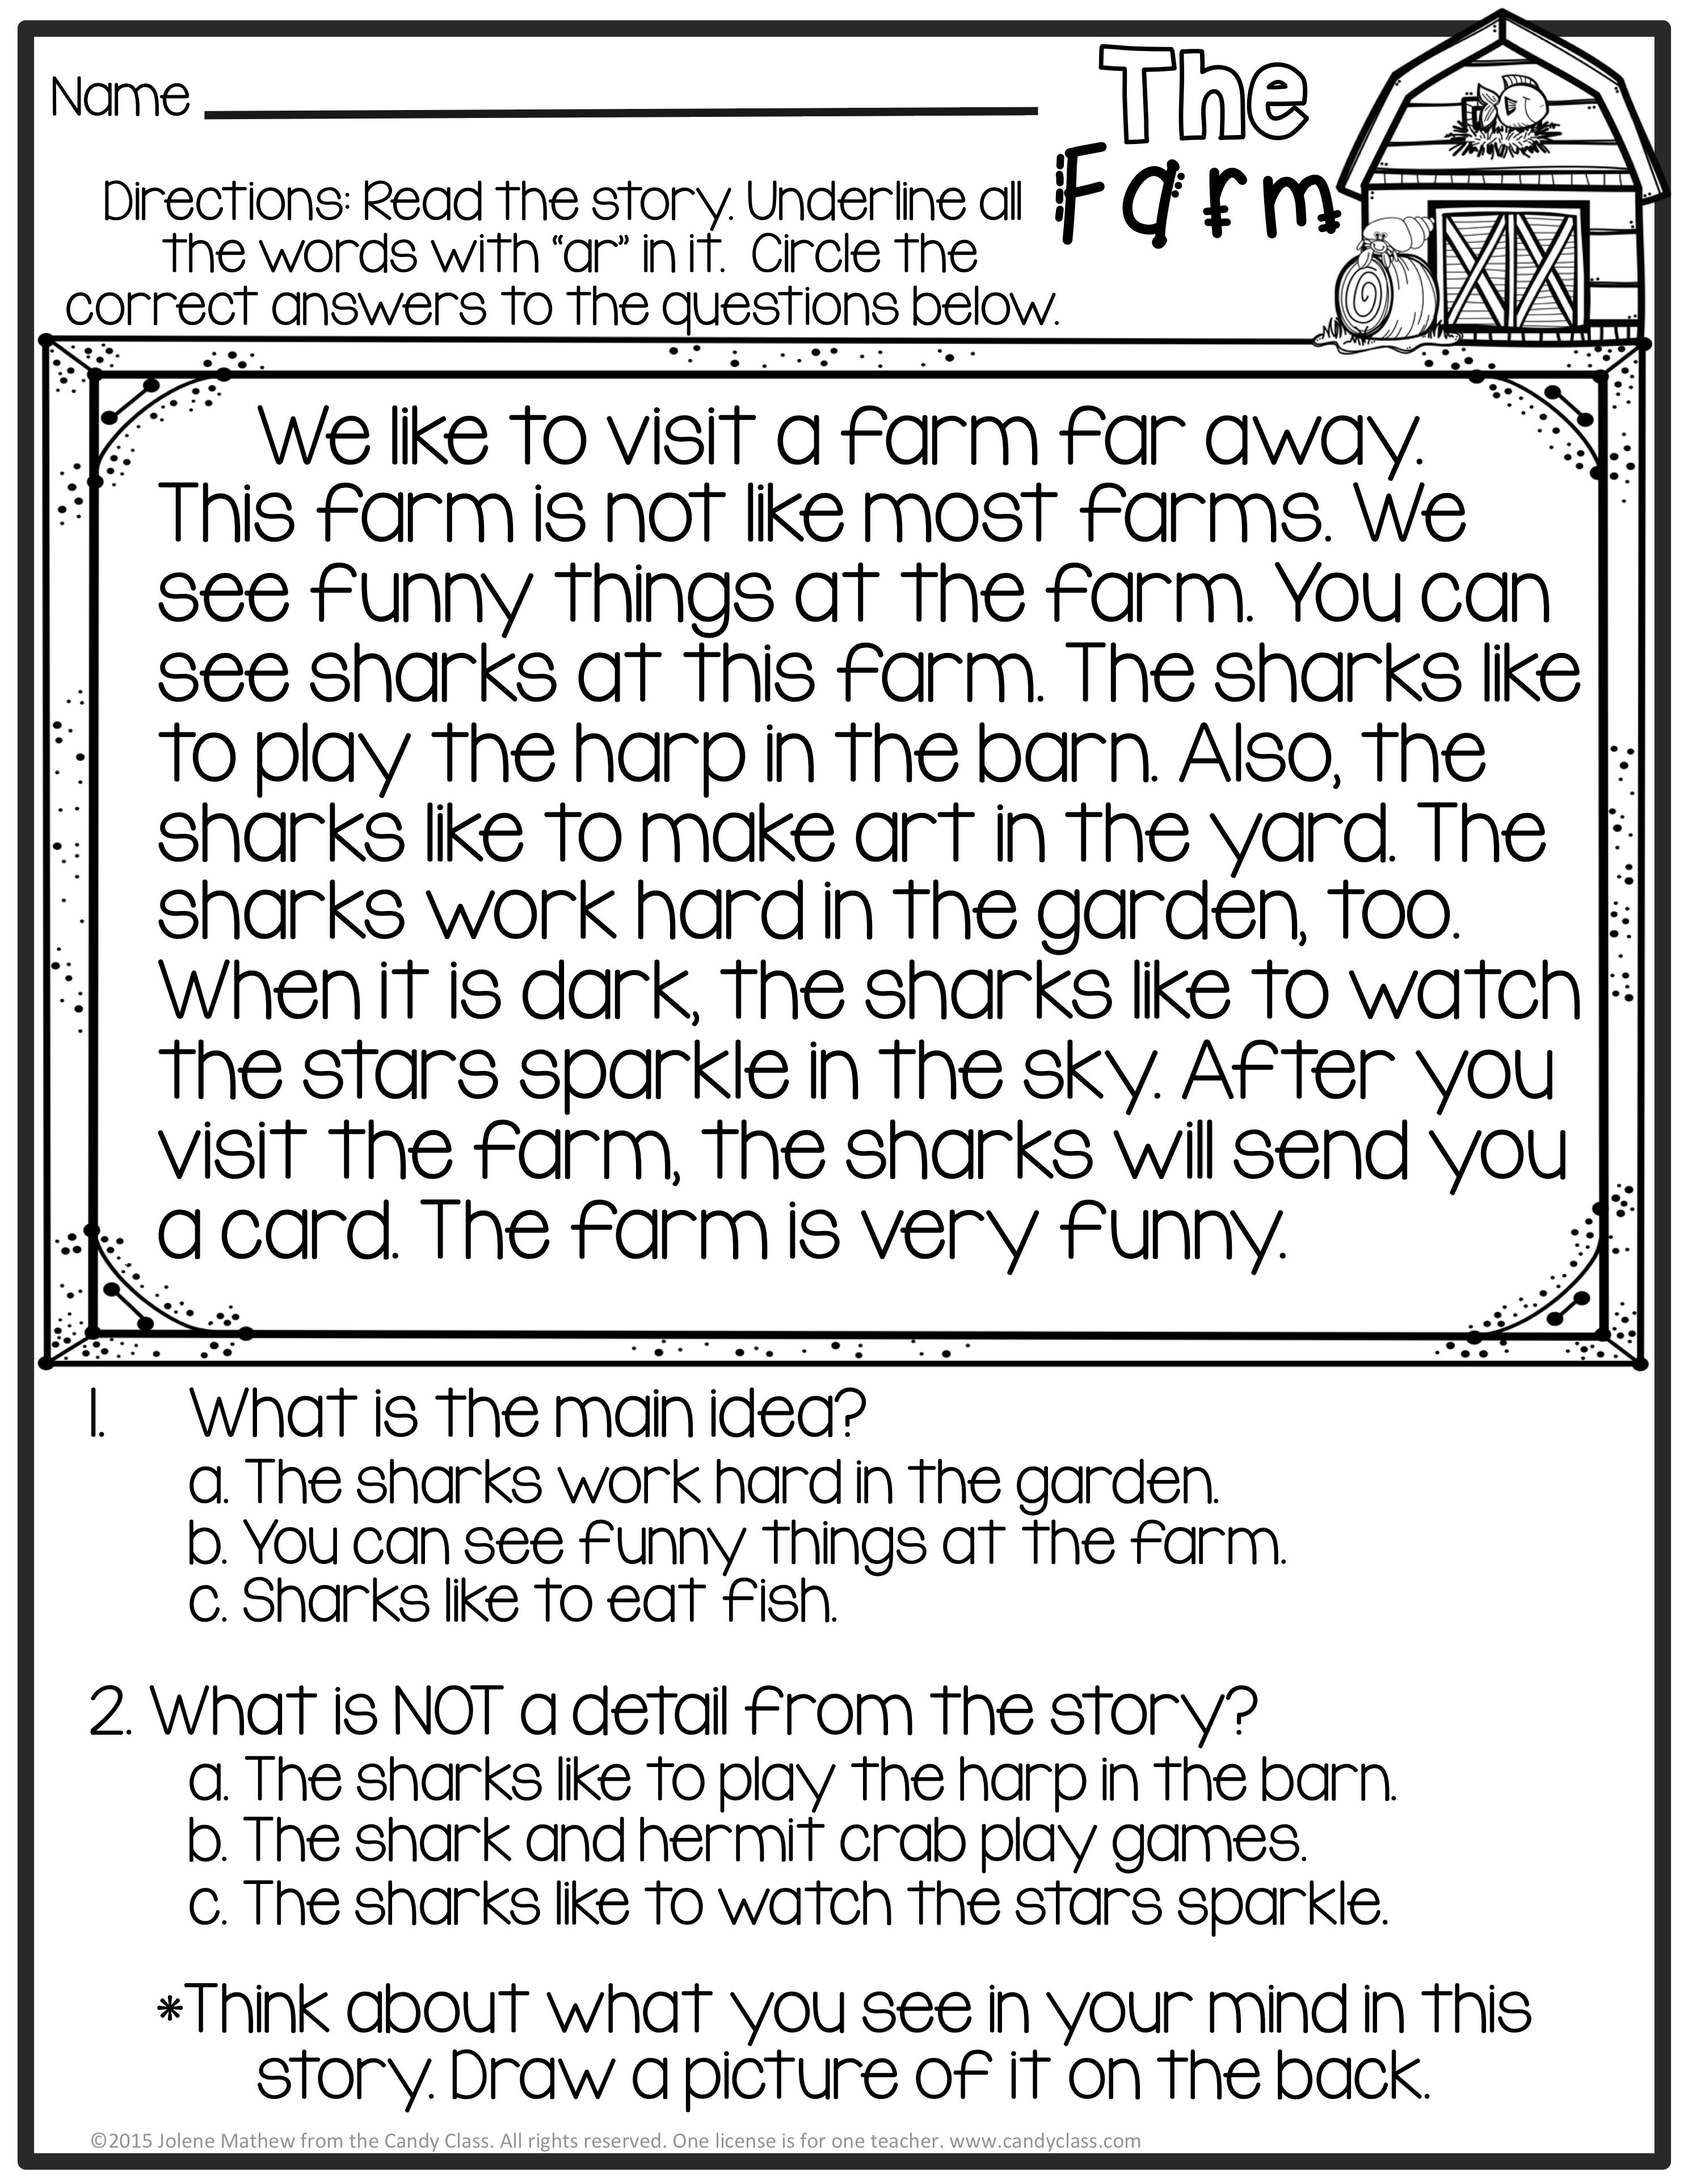 Bossy R No Prep Activities Phonics Worksheets 2nd Grade Morning Work Activities Reading Comprehension Passages Phonics Reading Reading Passages [ 3850 x 2975 Pixel ]